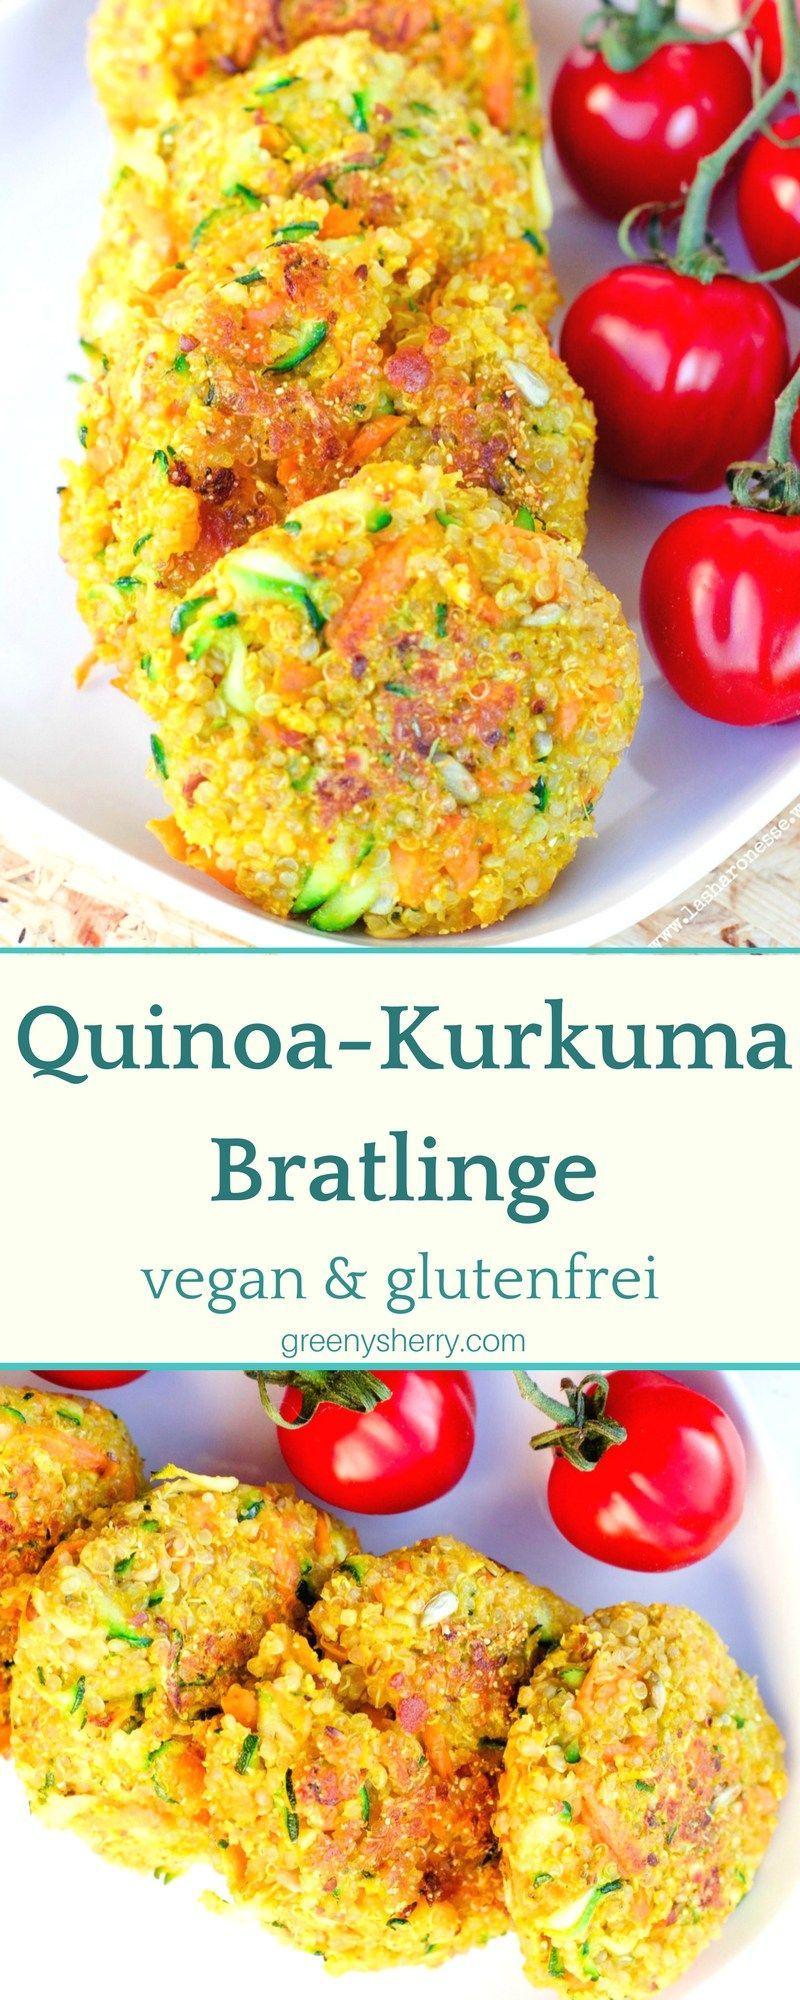 Crunchy Quinoa - Turmeric patties (vegan & gluten free) - Greeny Sherry - Vegan recipes & live gree